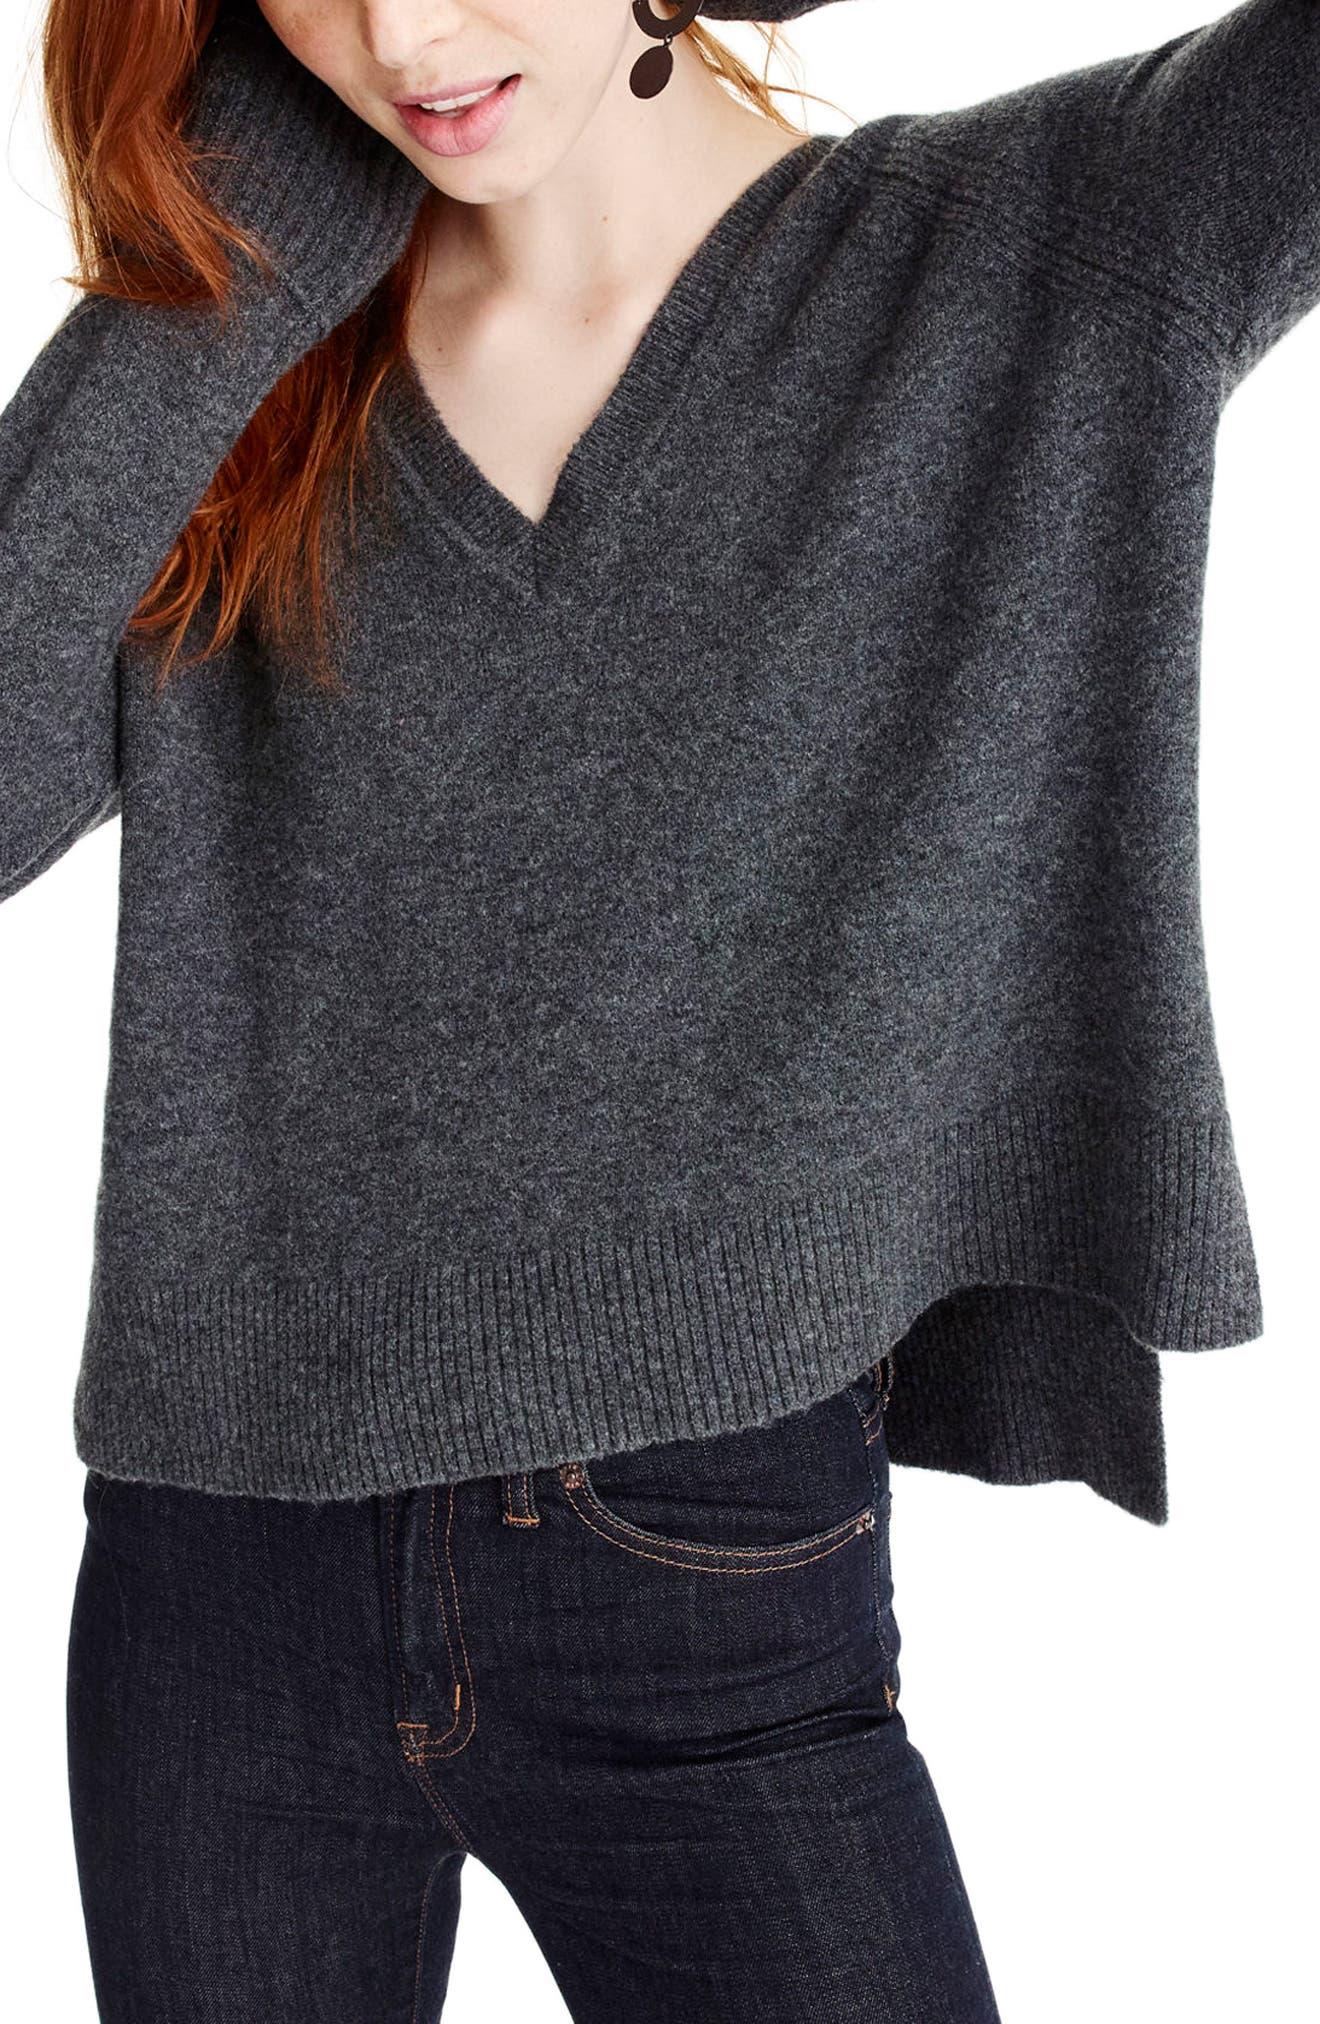 Main Image - J.Crew Supersoft Yarn V-Neck Sweater